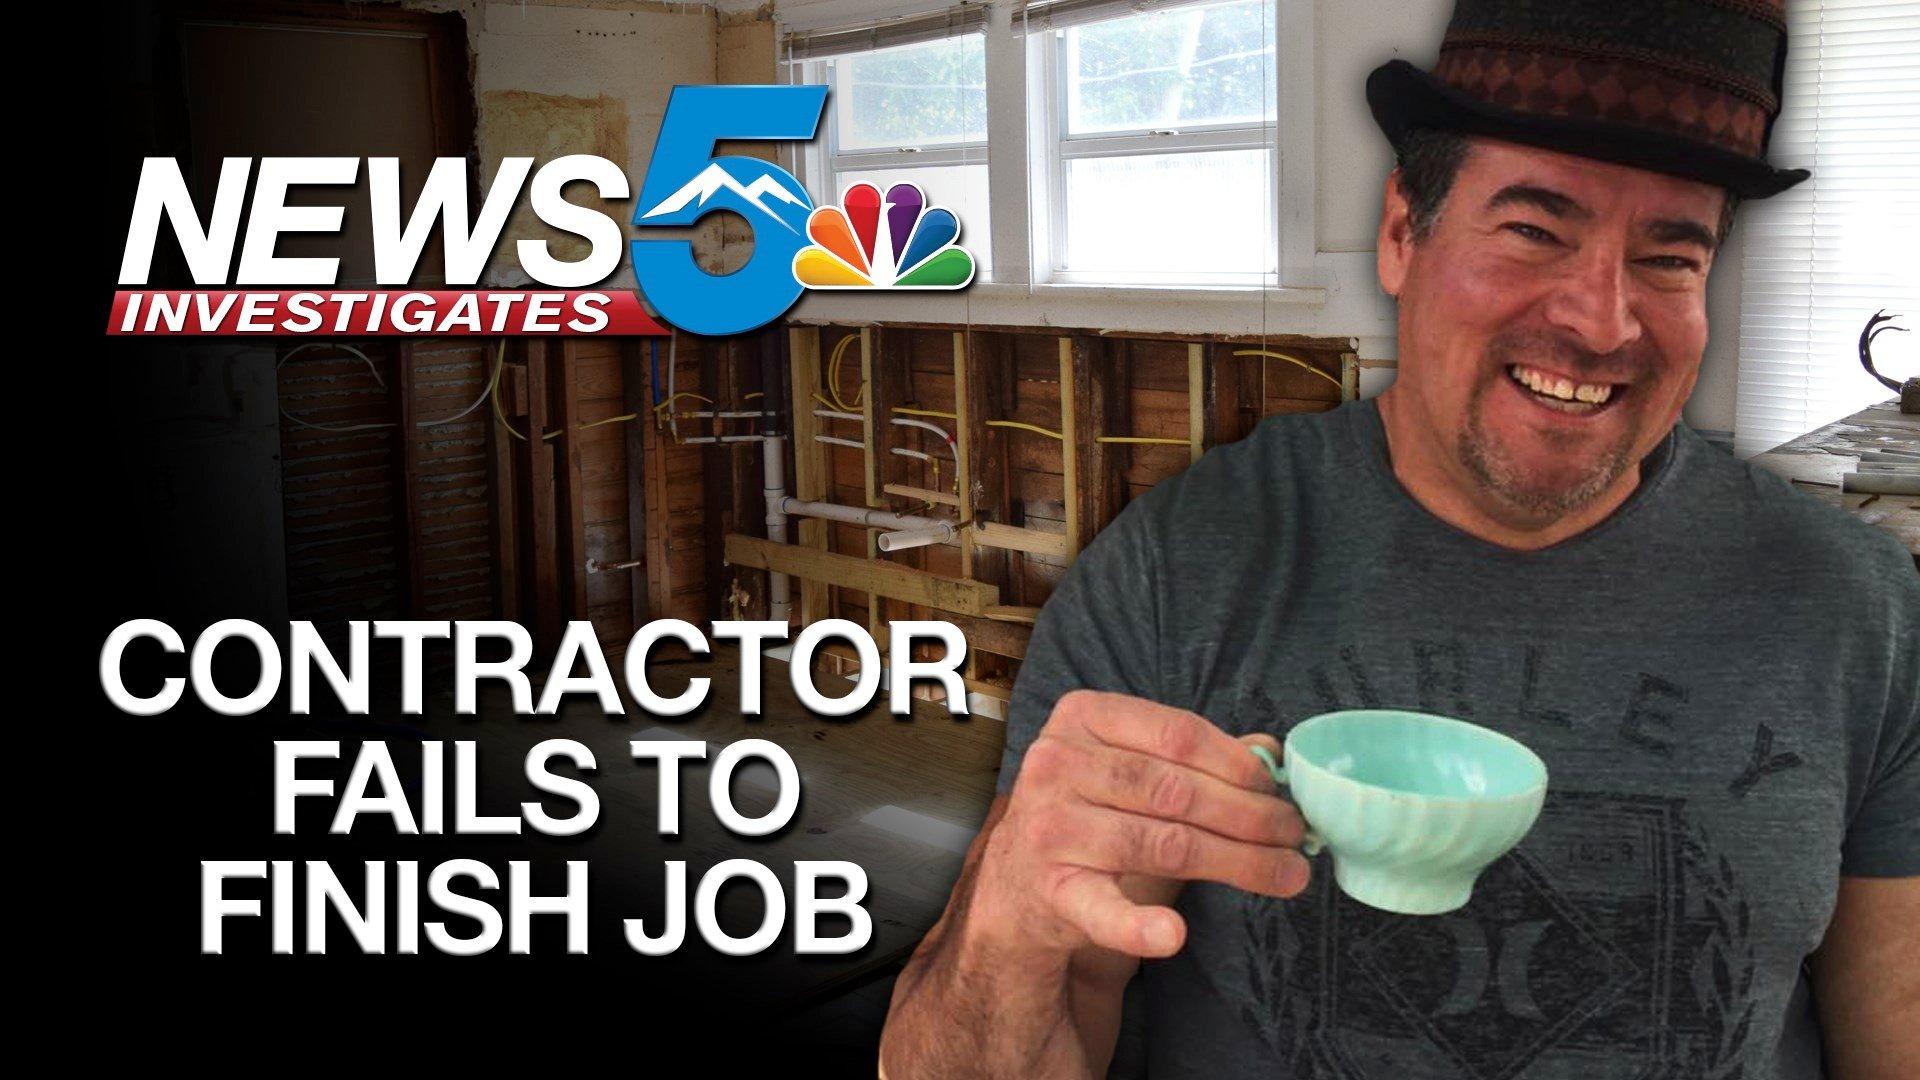 Contractor Todd Braudis